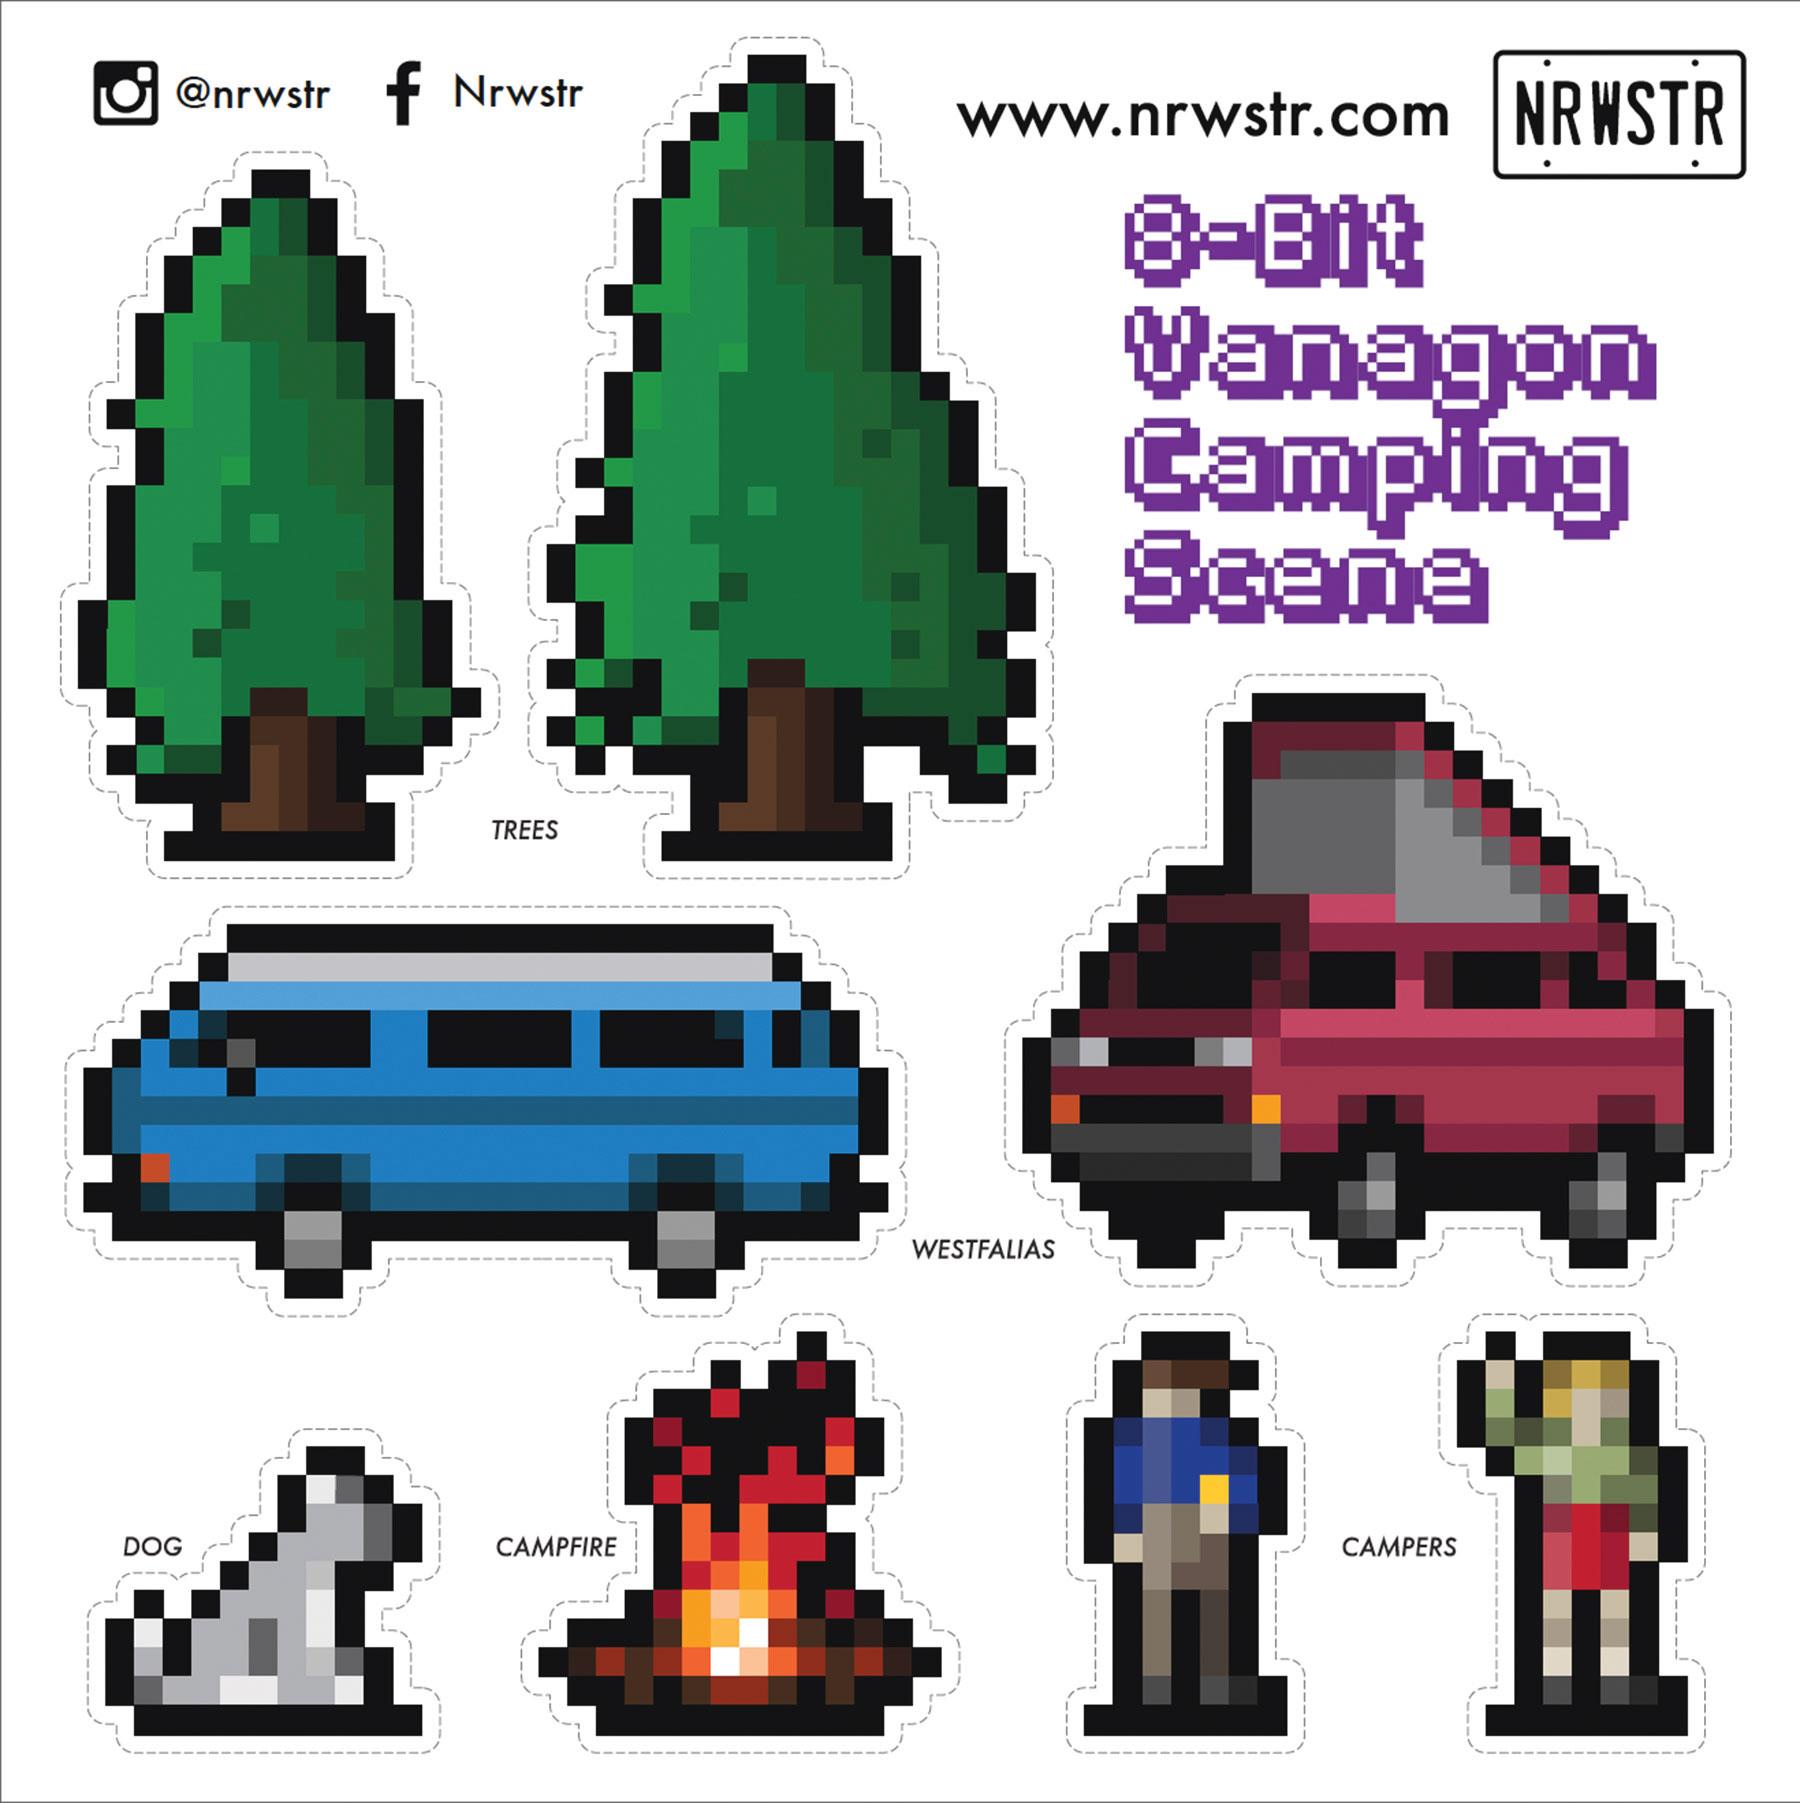 8-bit-vanagon-scene-6x6-print-final2-sm.jpg